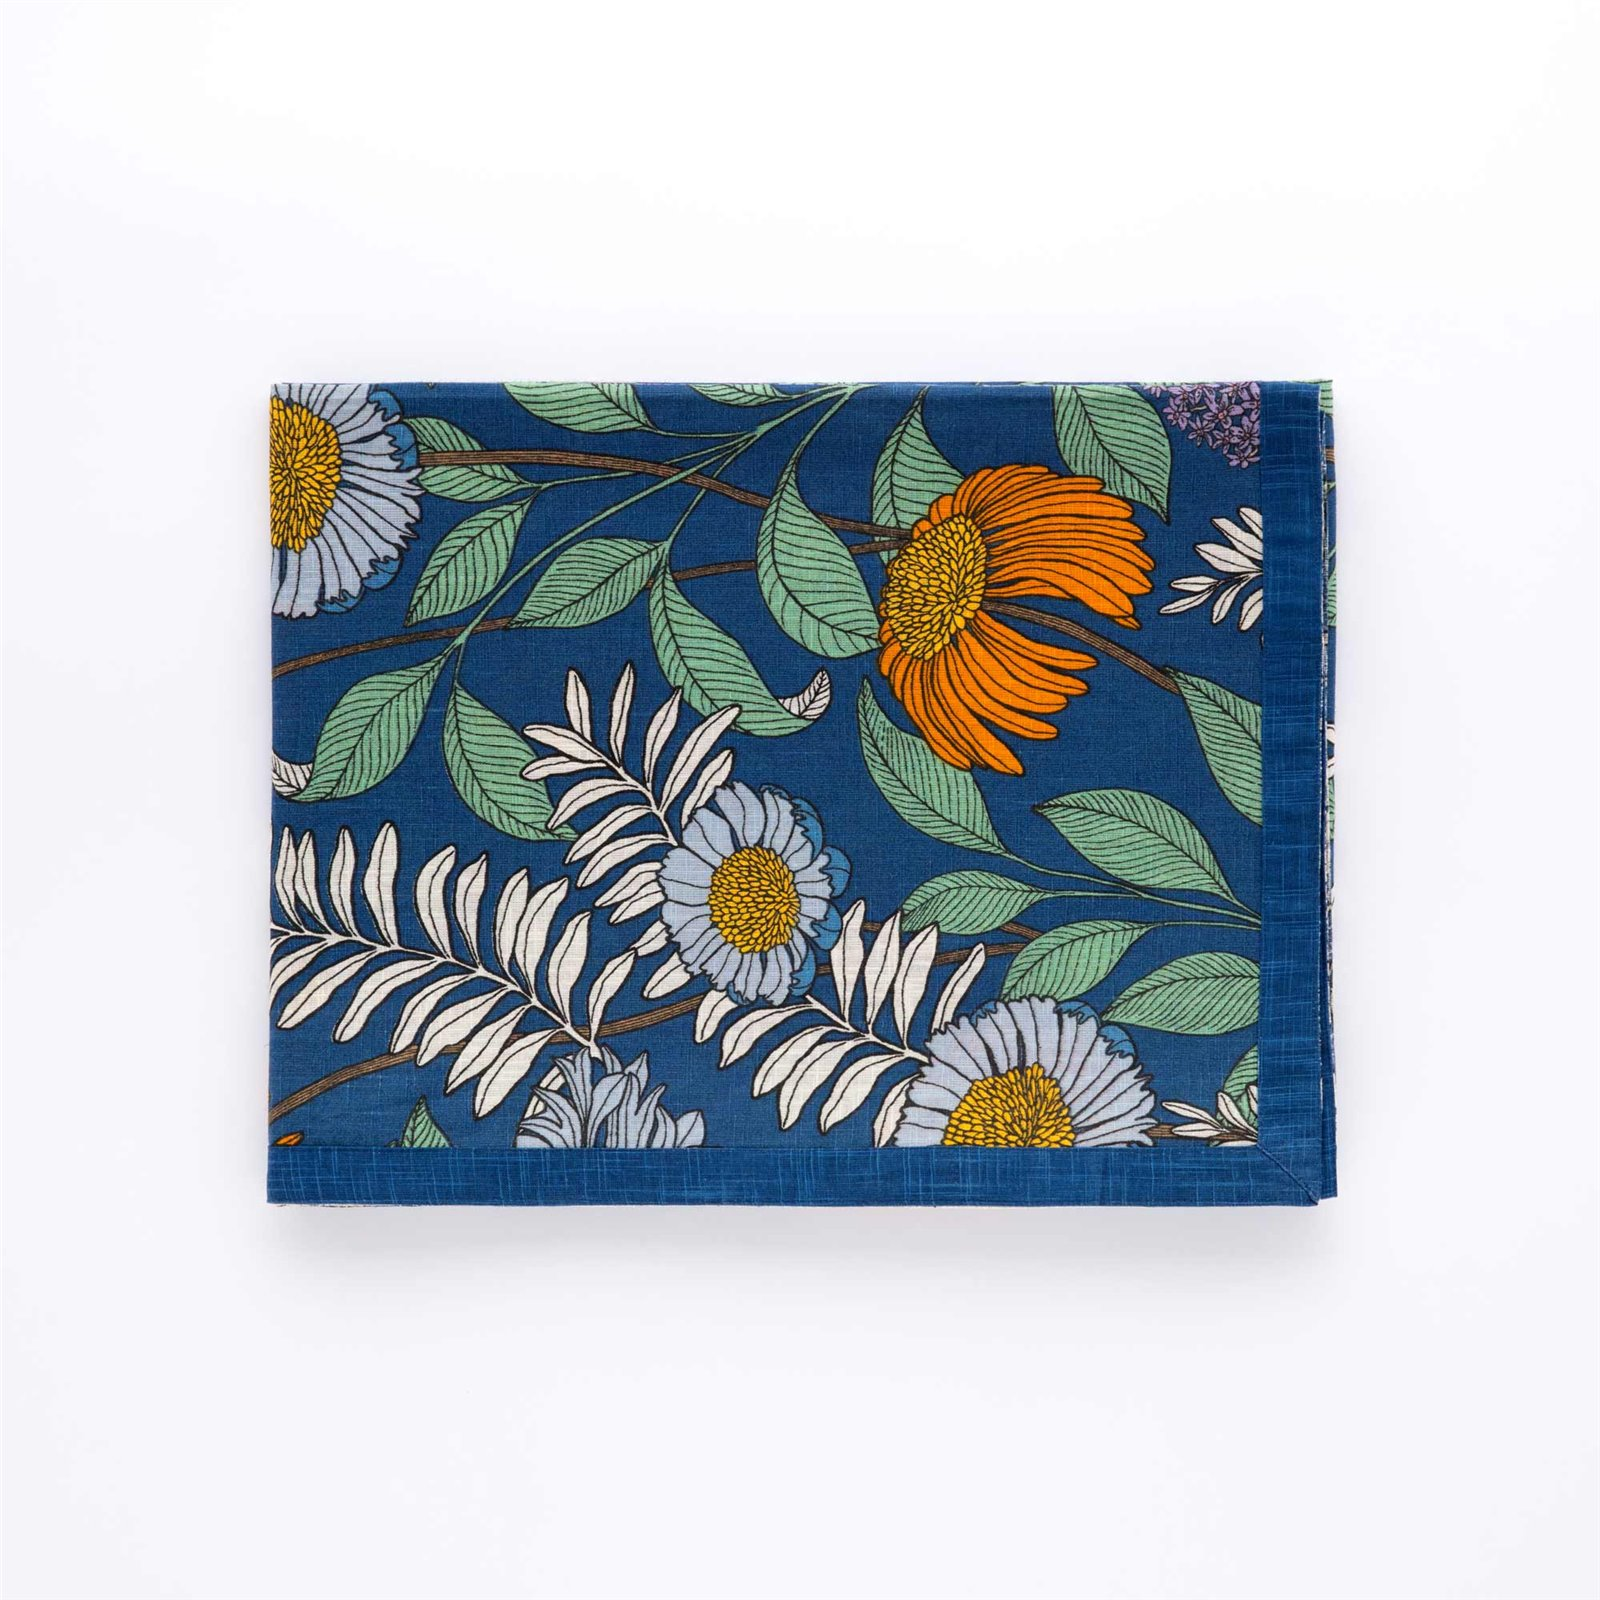 Tito Solid color Taffeta Curtain fabric by the metre